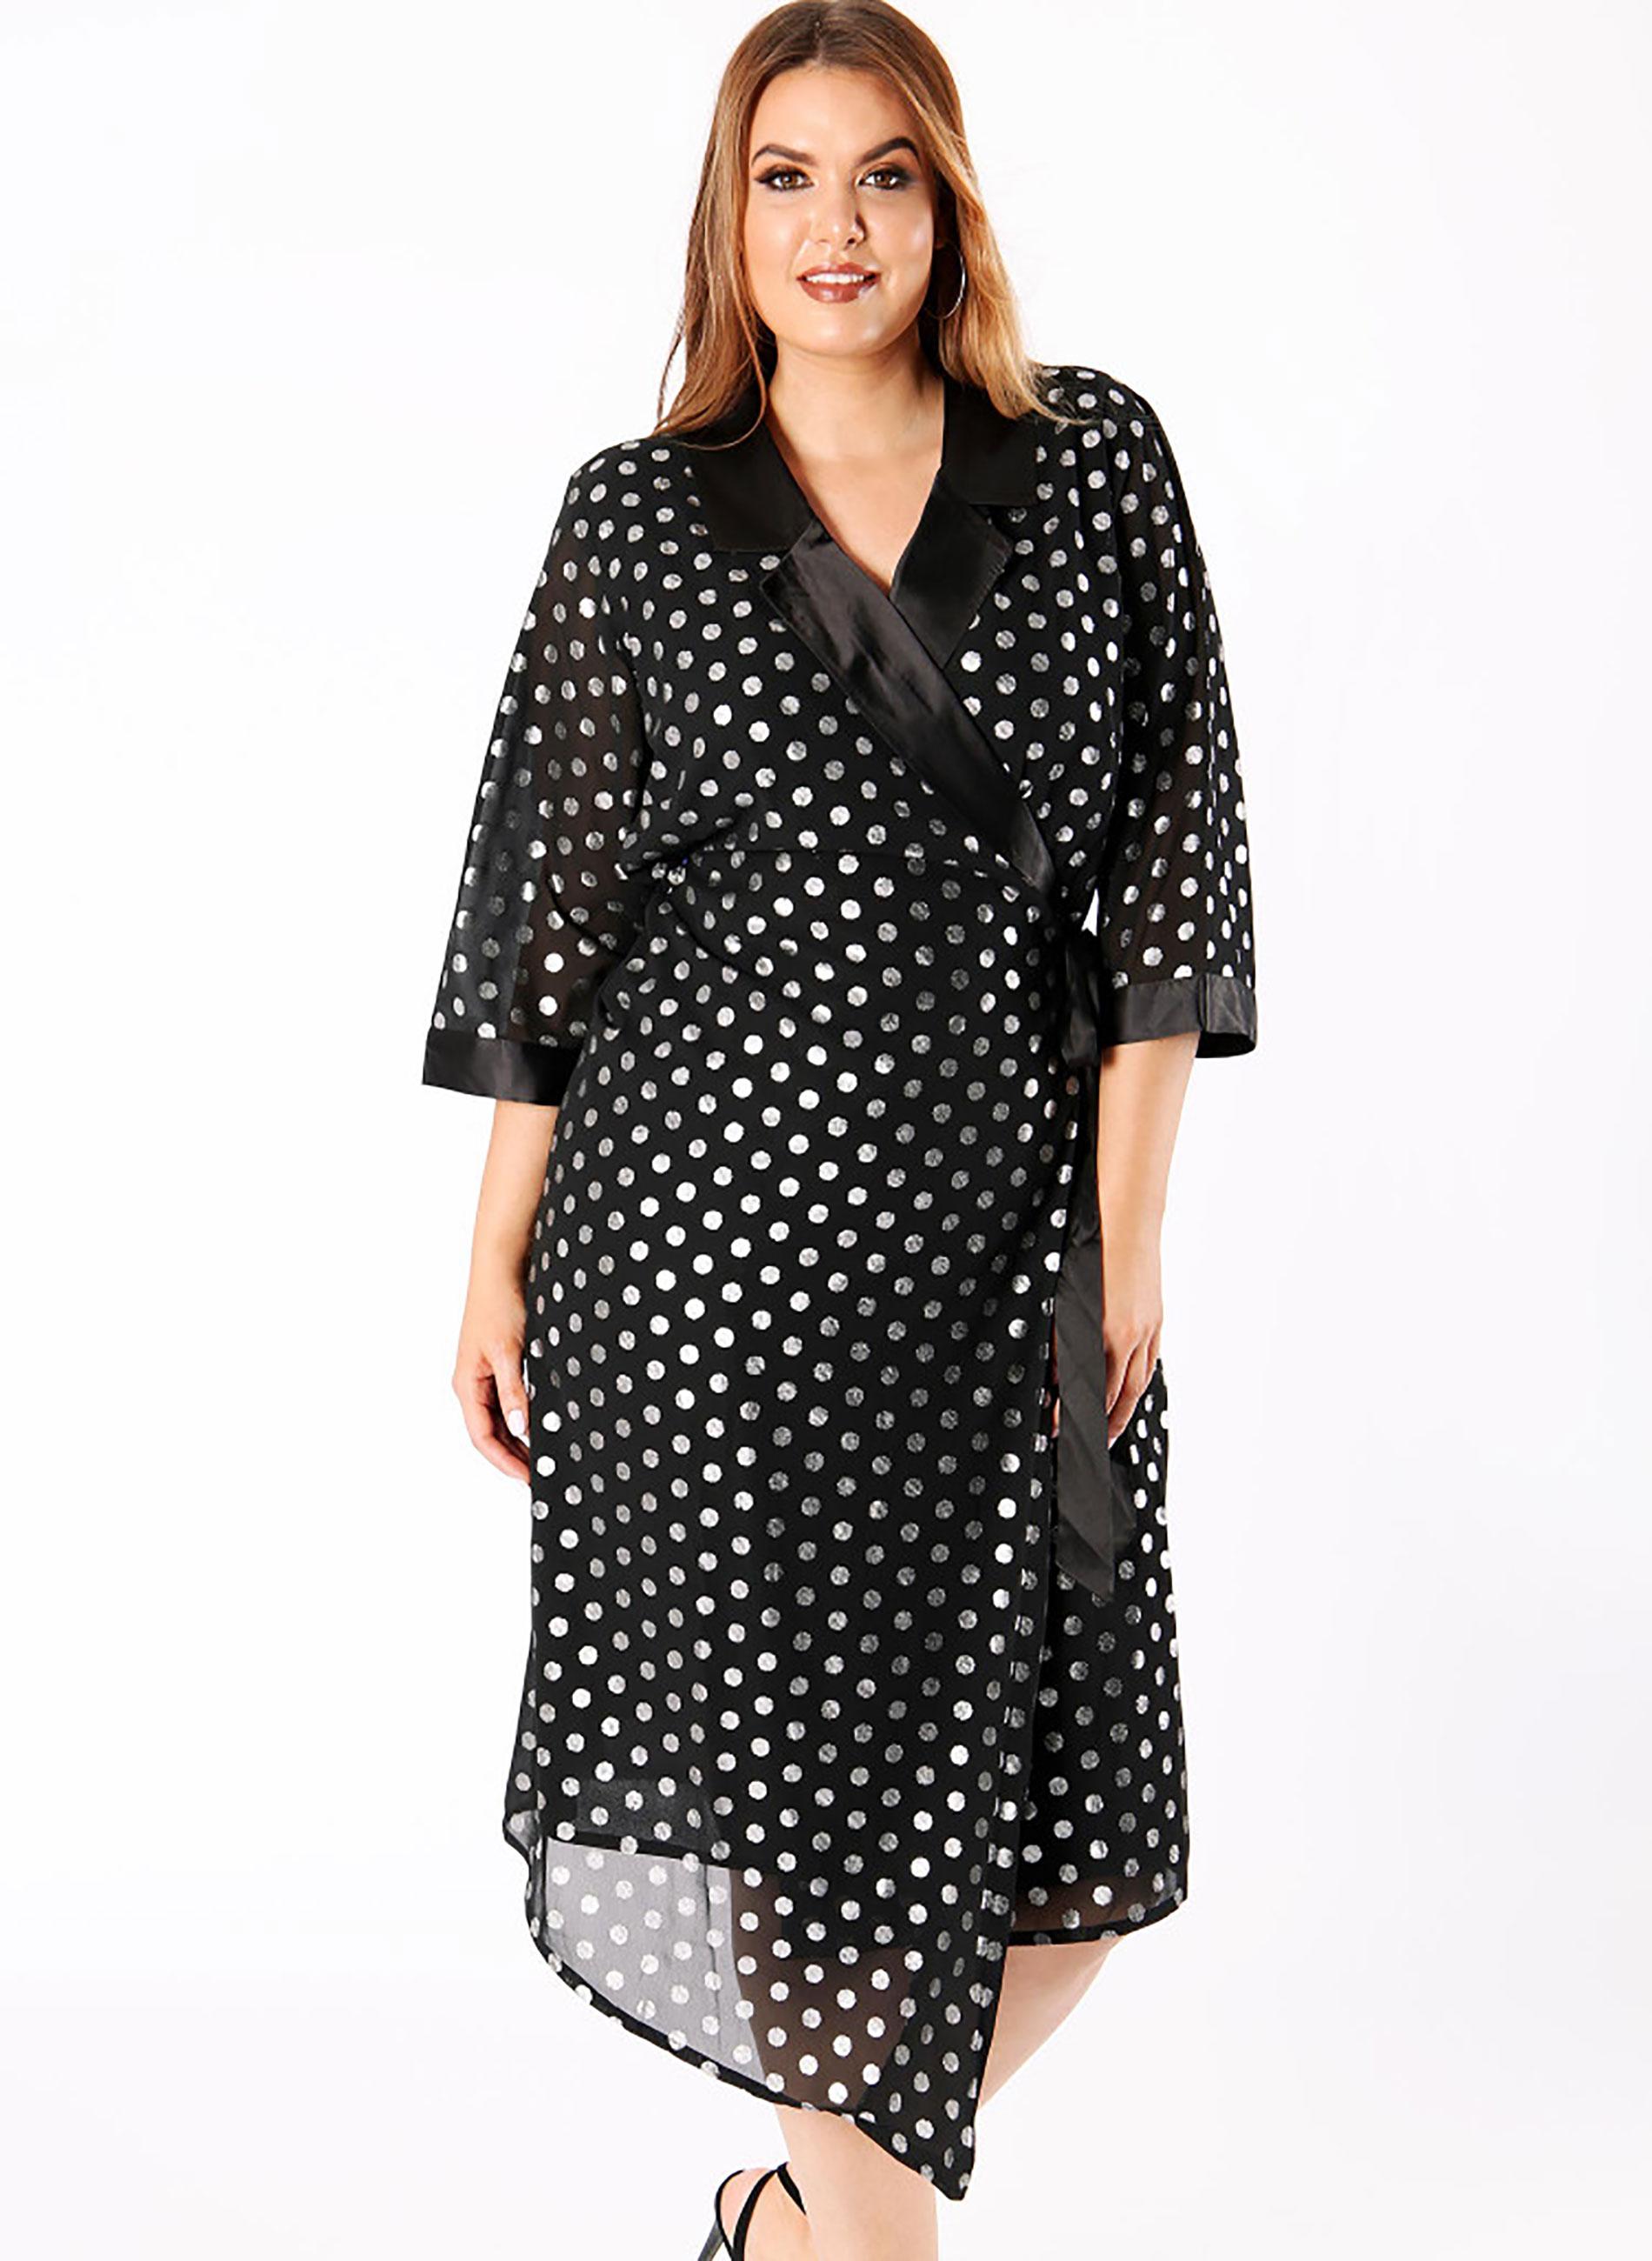 1d5f13e555ec ΜΕΓΑΛΑ ΜΕΓΕΘΗ ΦΟΡΕΜΑΤΑ    Μαύρο Φόρεμα με Ασημί Πουά - Μόδα σε ...